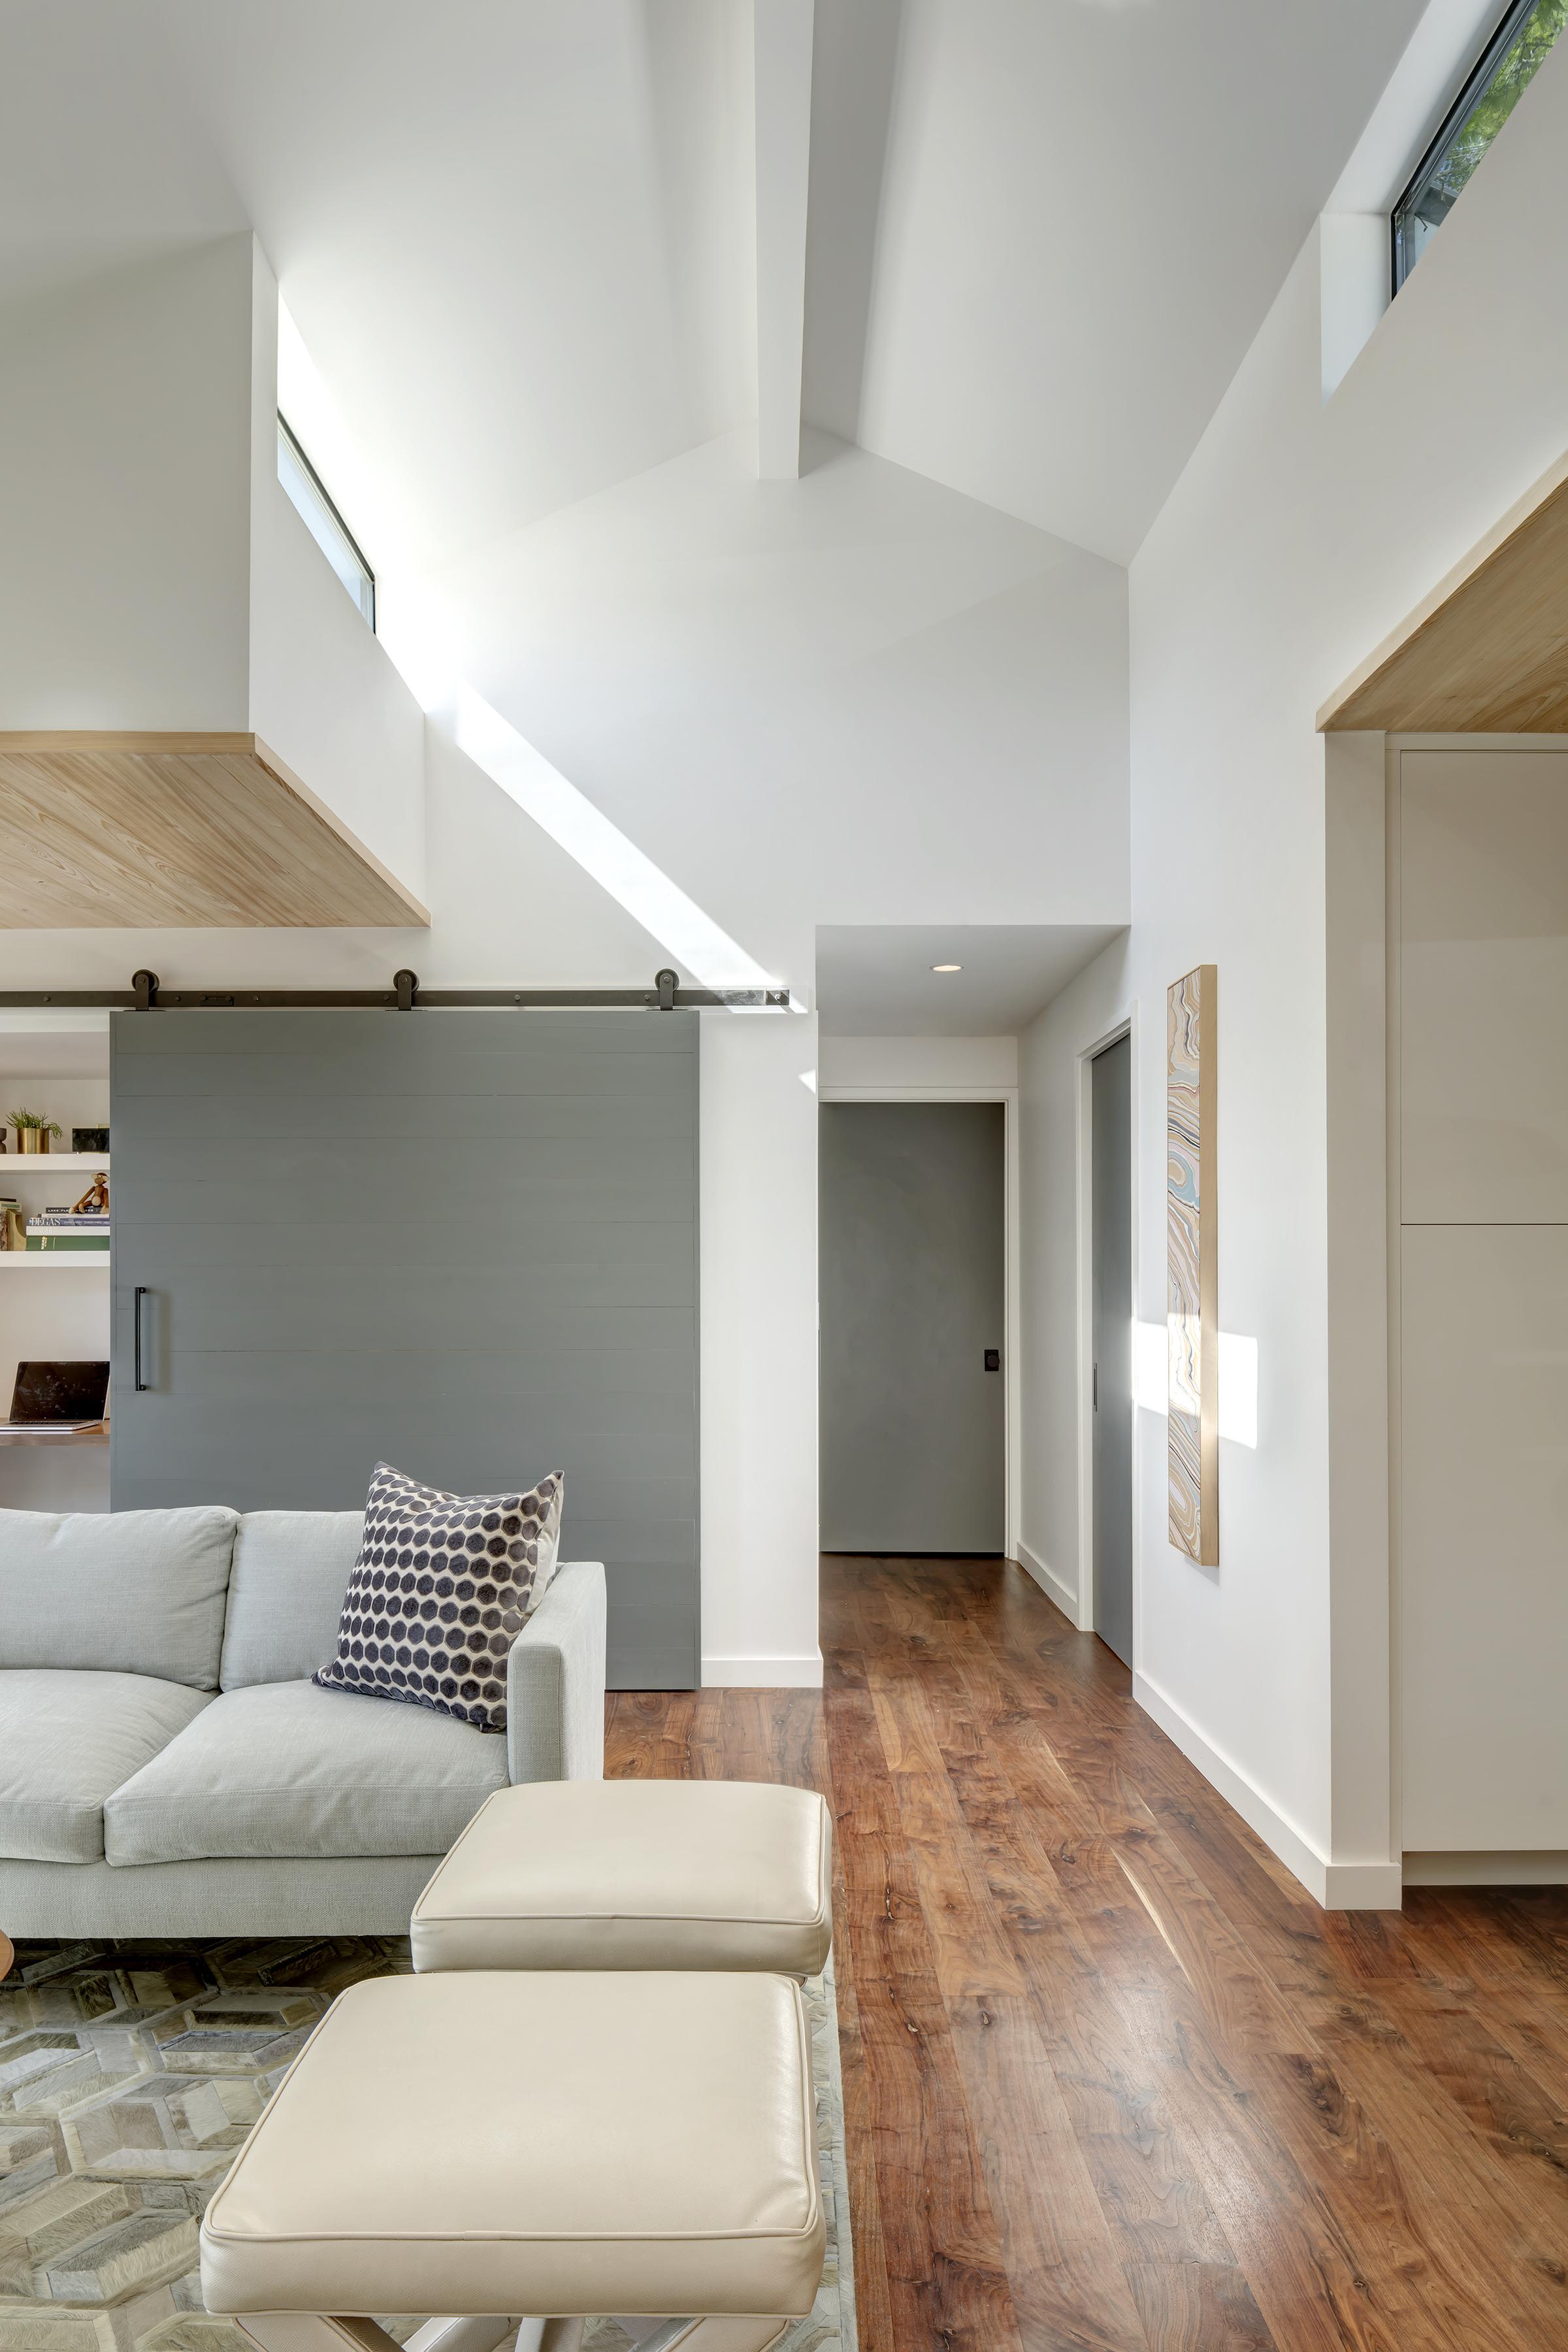 Interlock House by Matt Fajkus MF Architecture_Photo 4 by Charles Davis Smith.jpg